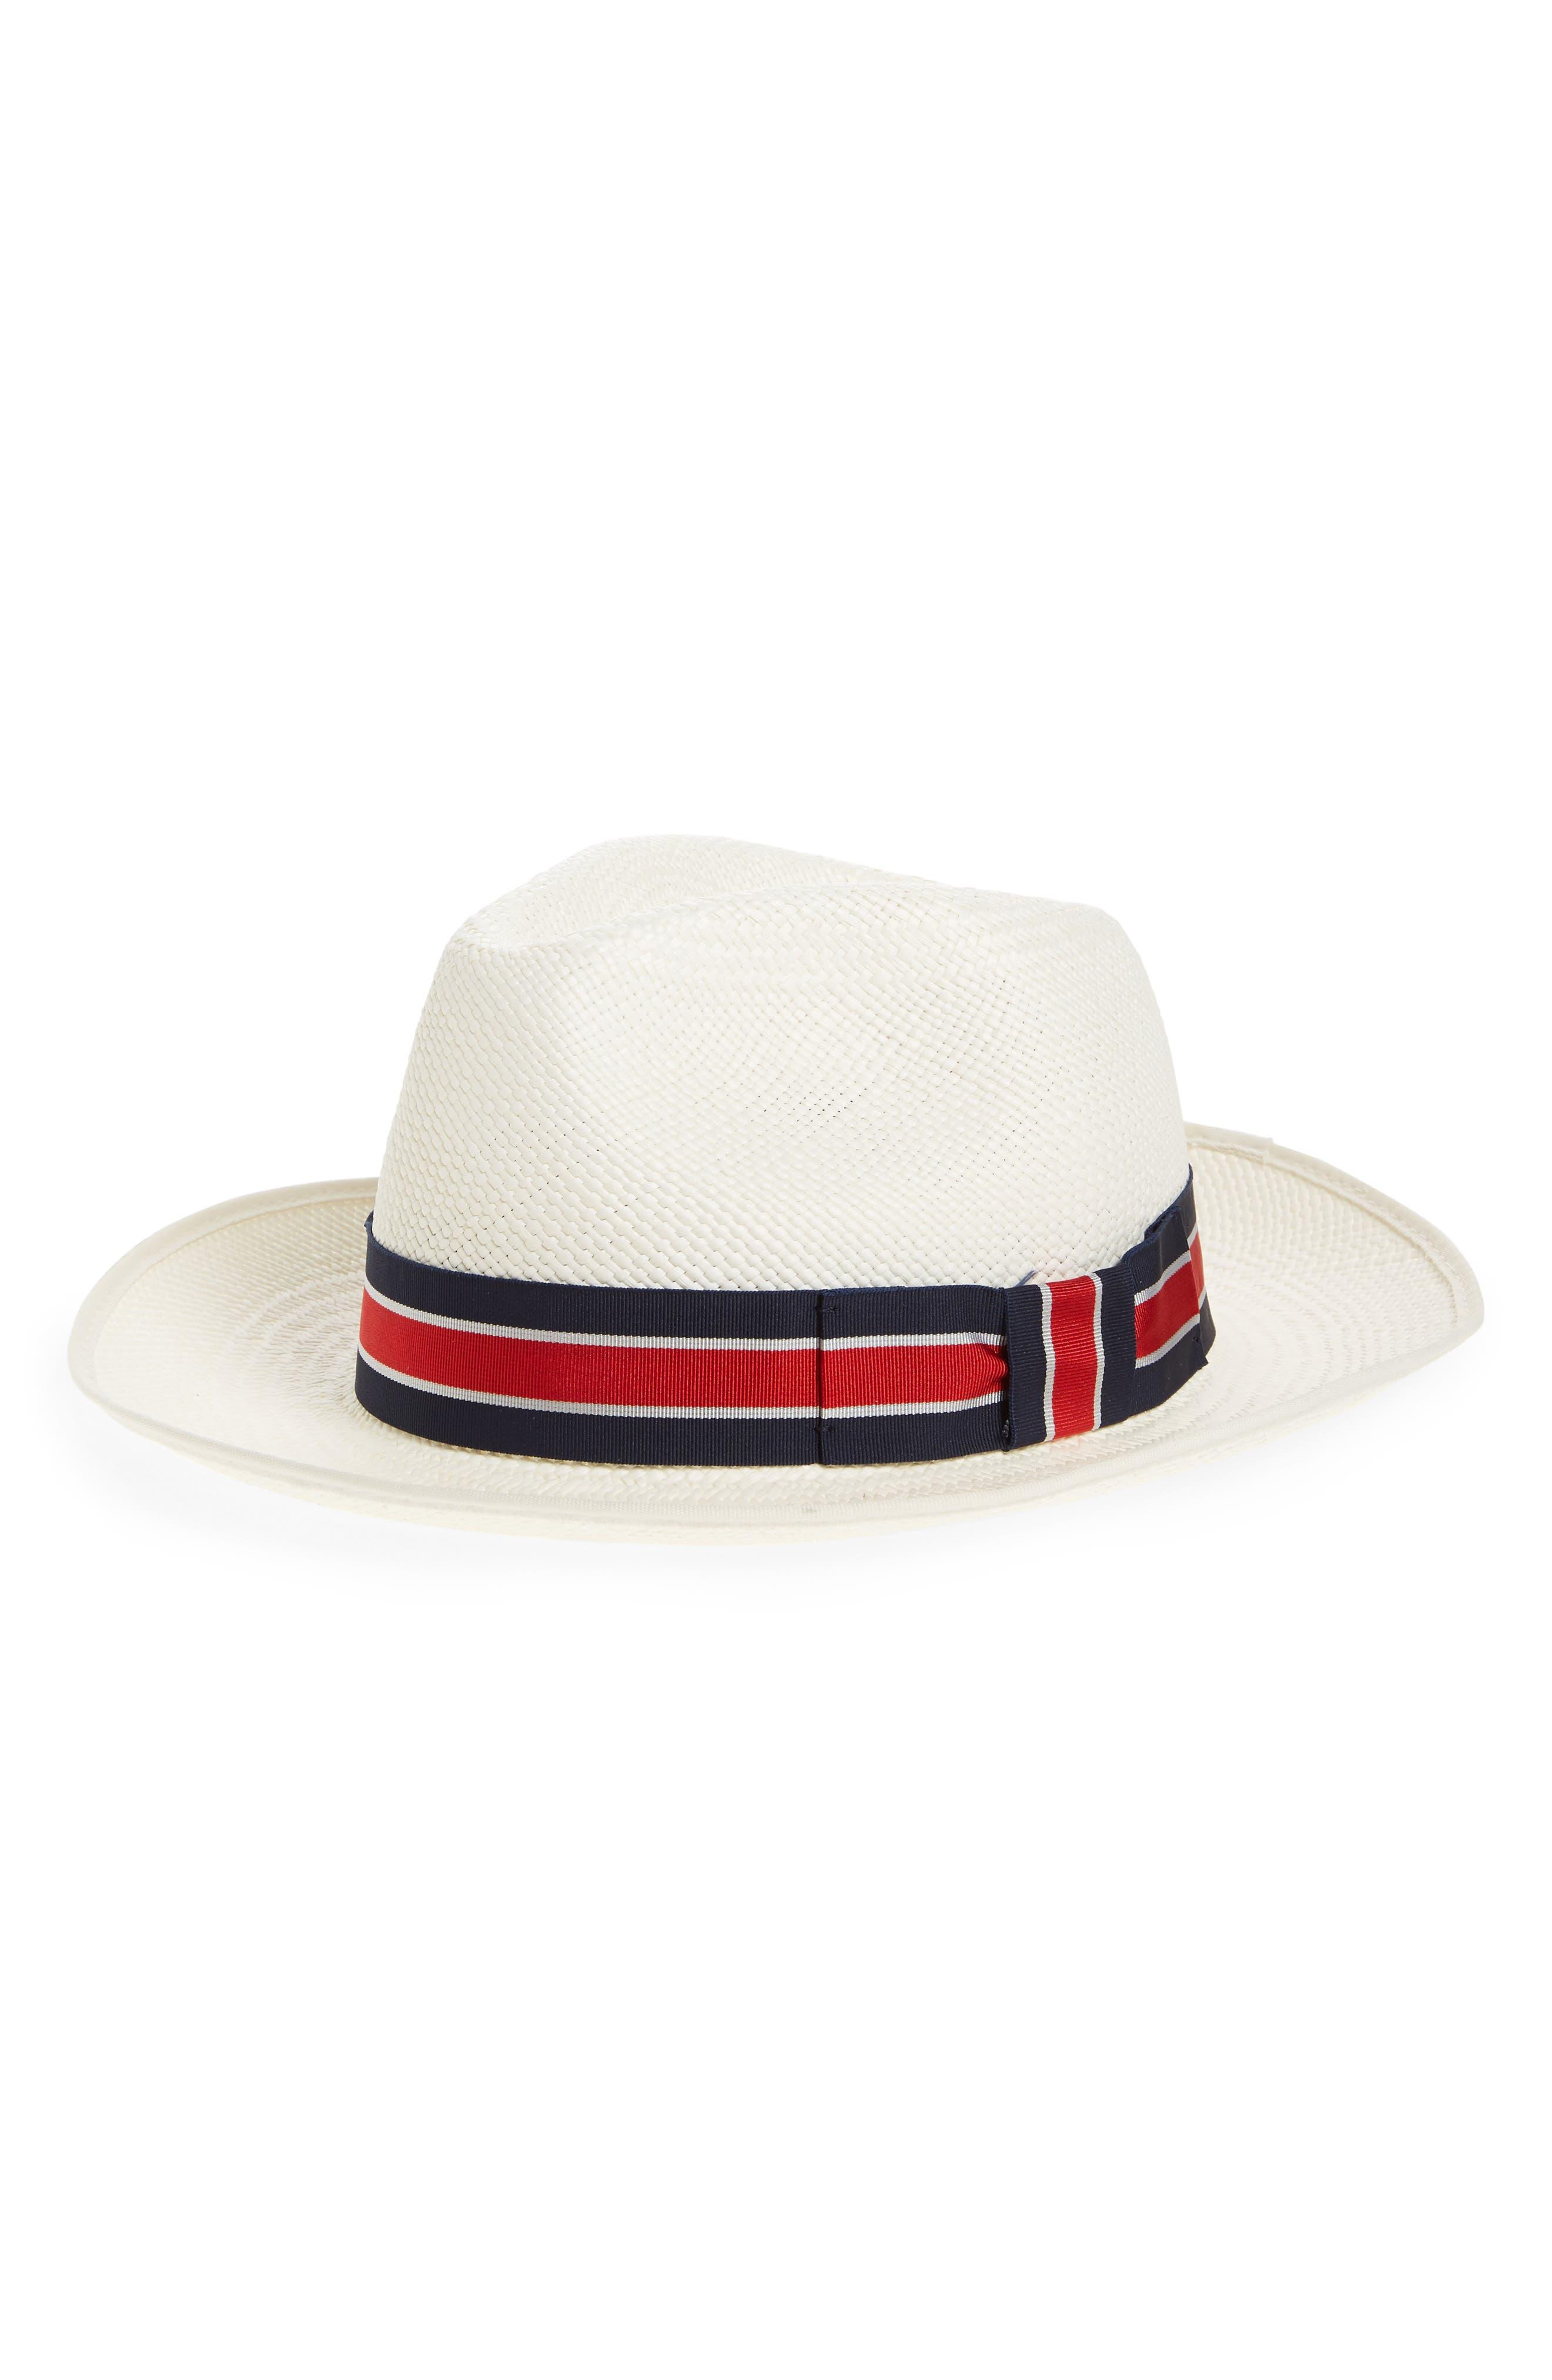 Christy's Preset Panama Hat,                         Main,                         color, 250